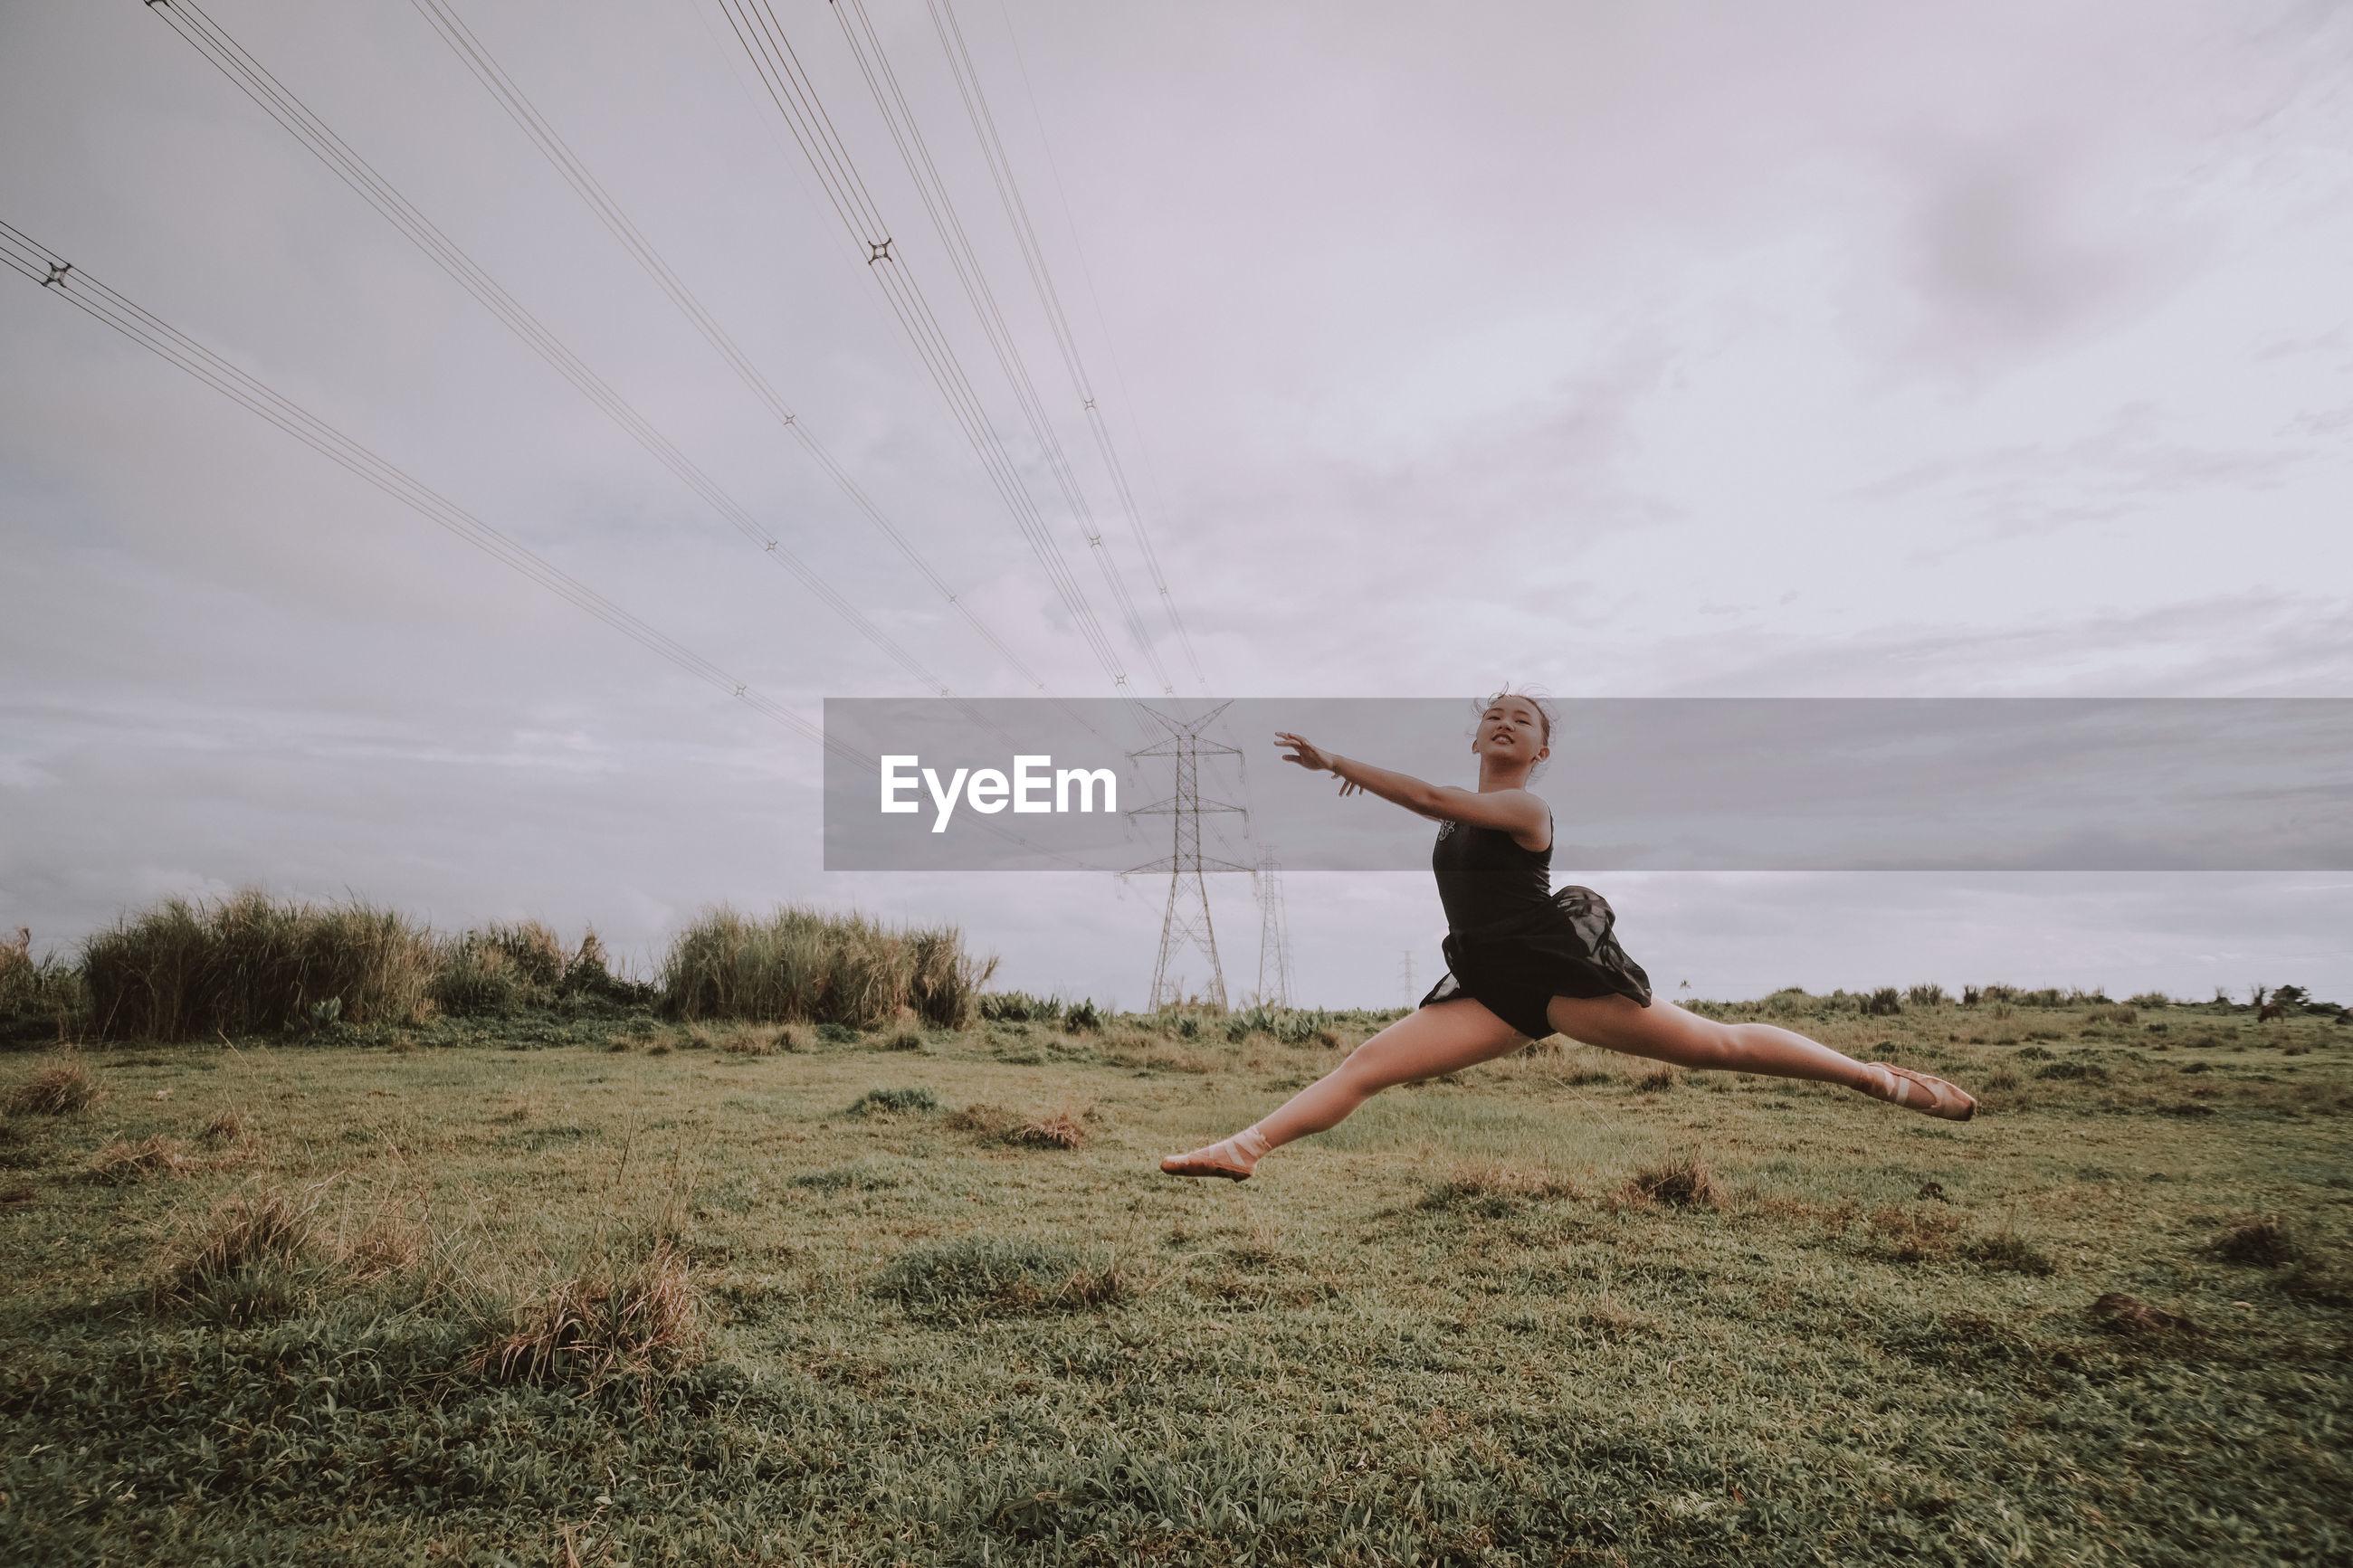 Ballerina jumping on grassy land against sky